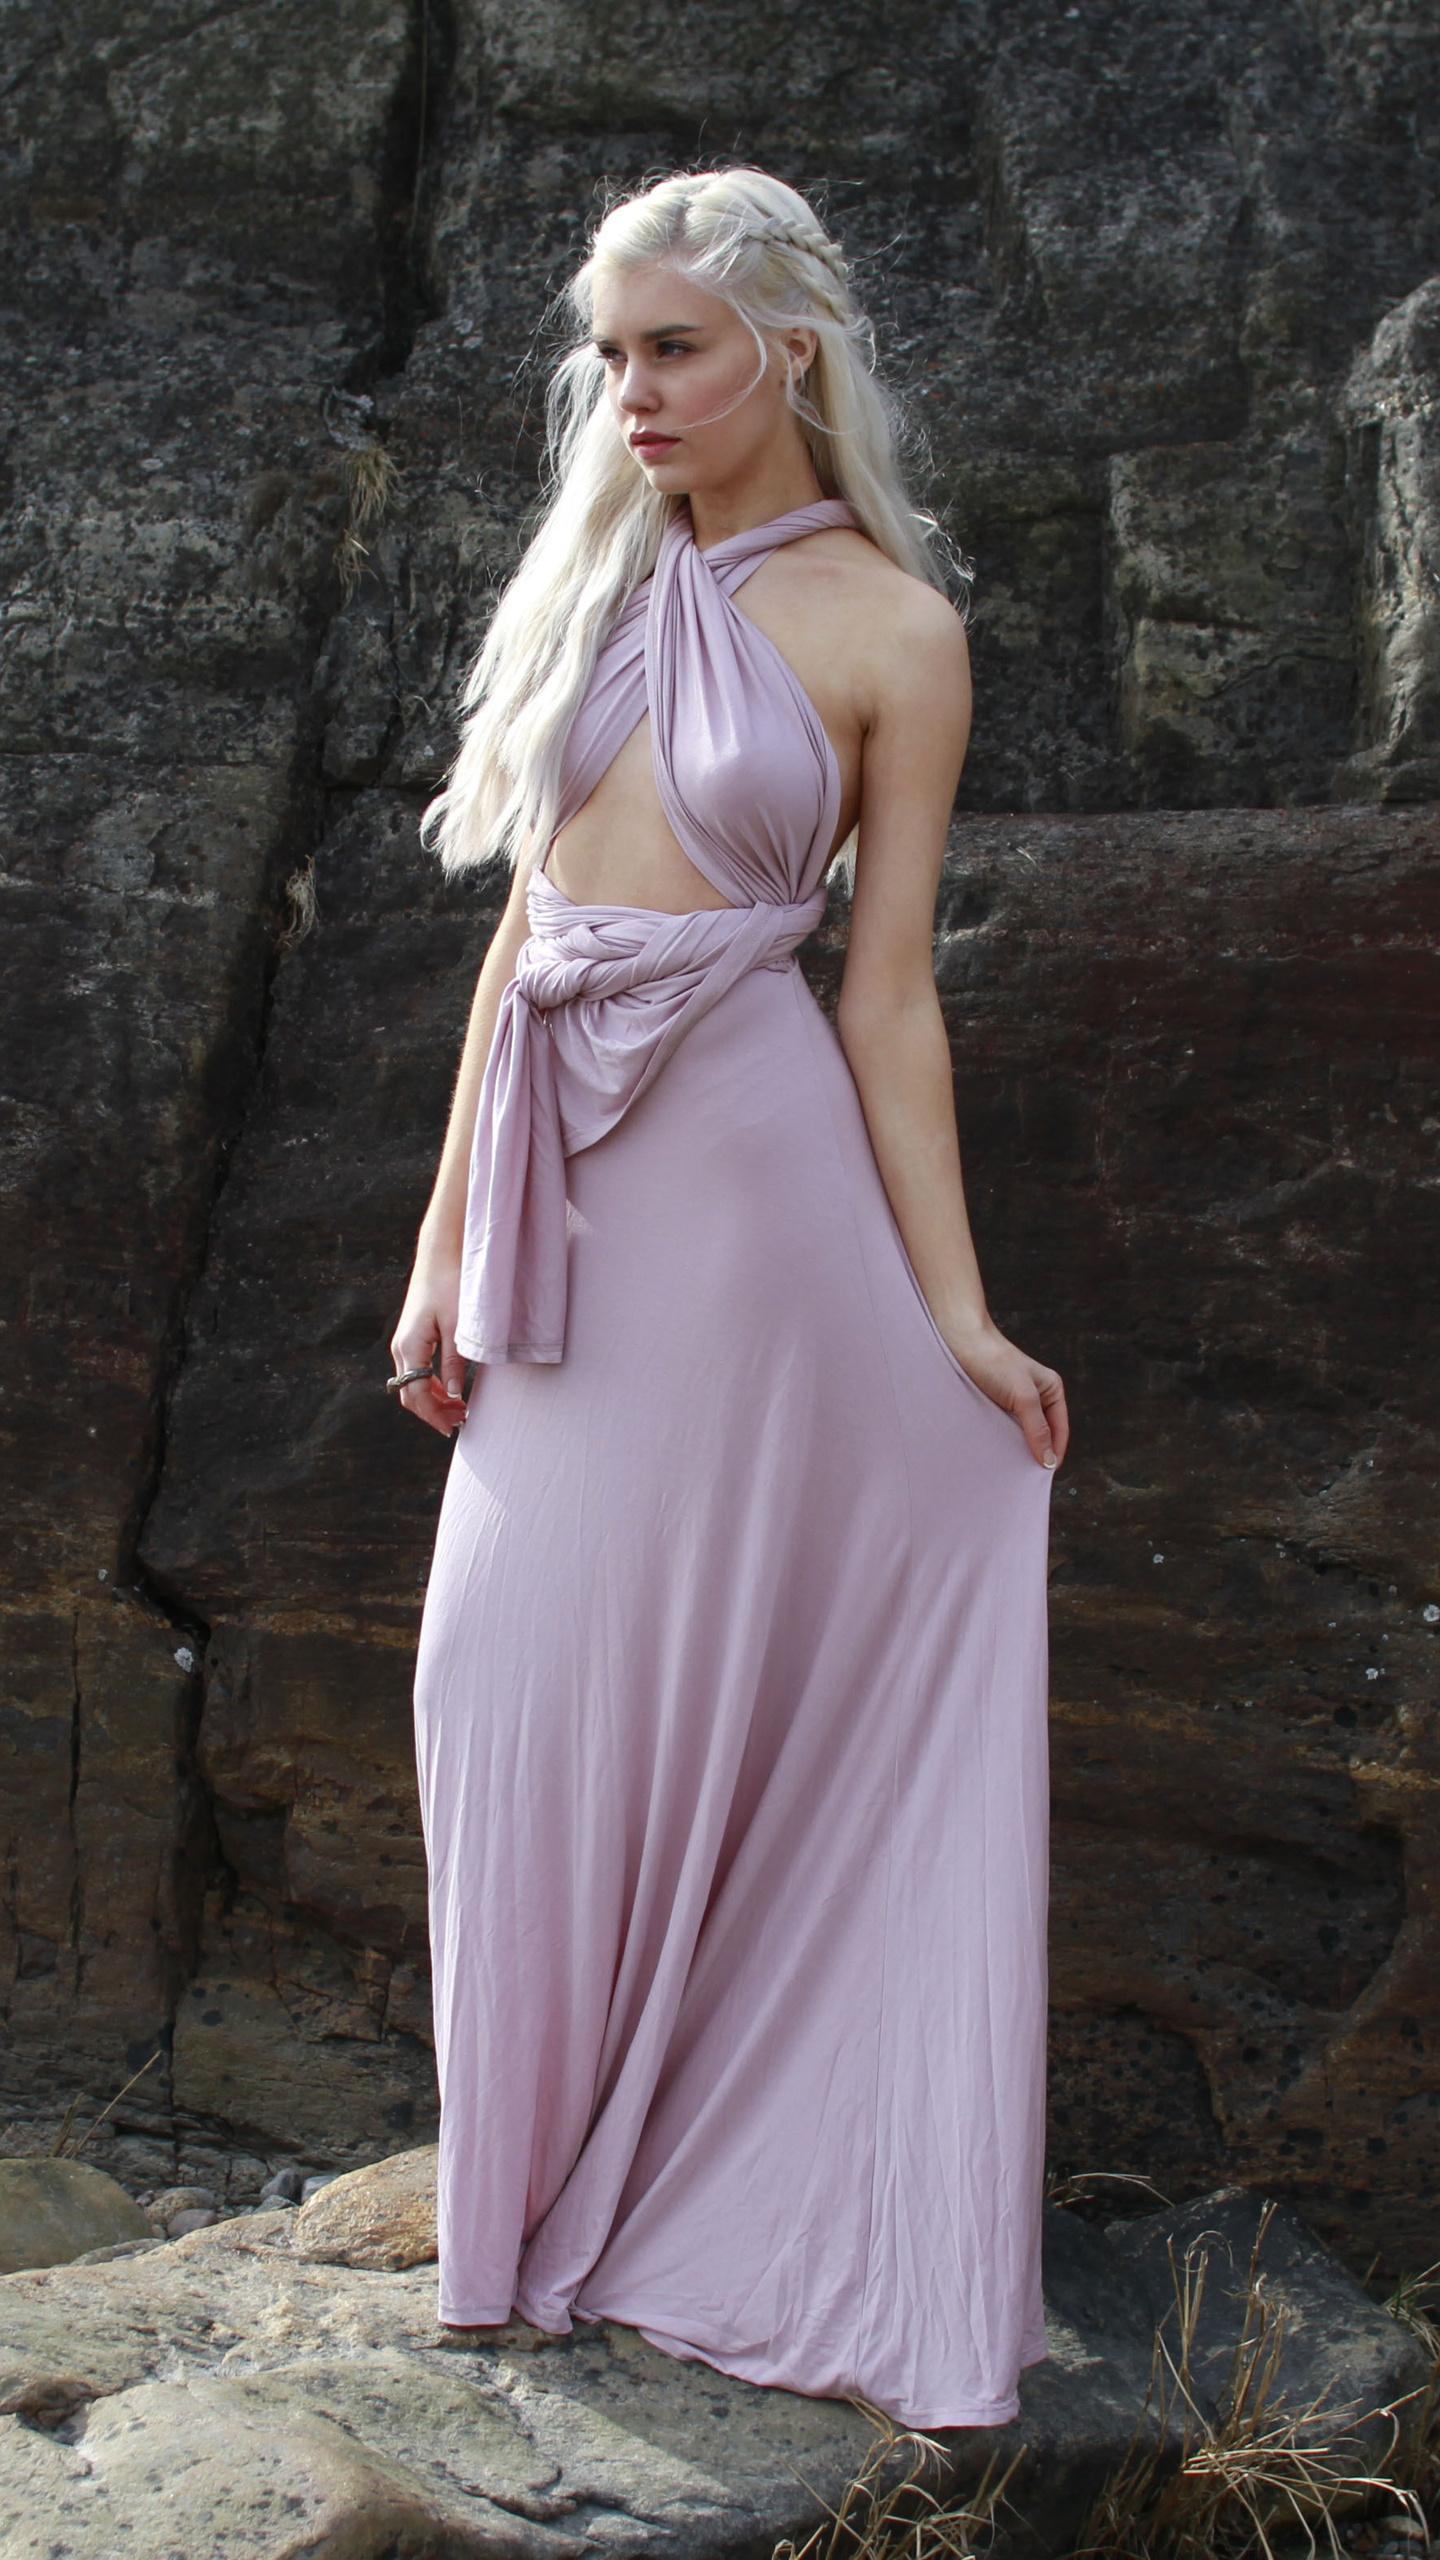 daenerys-targaryen-cosplay-ny.jpg